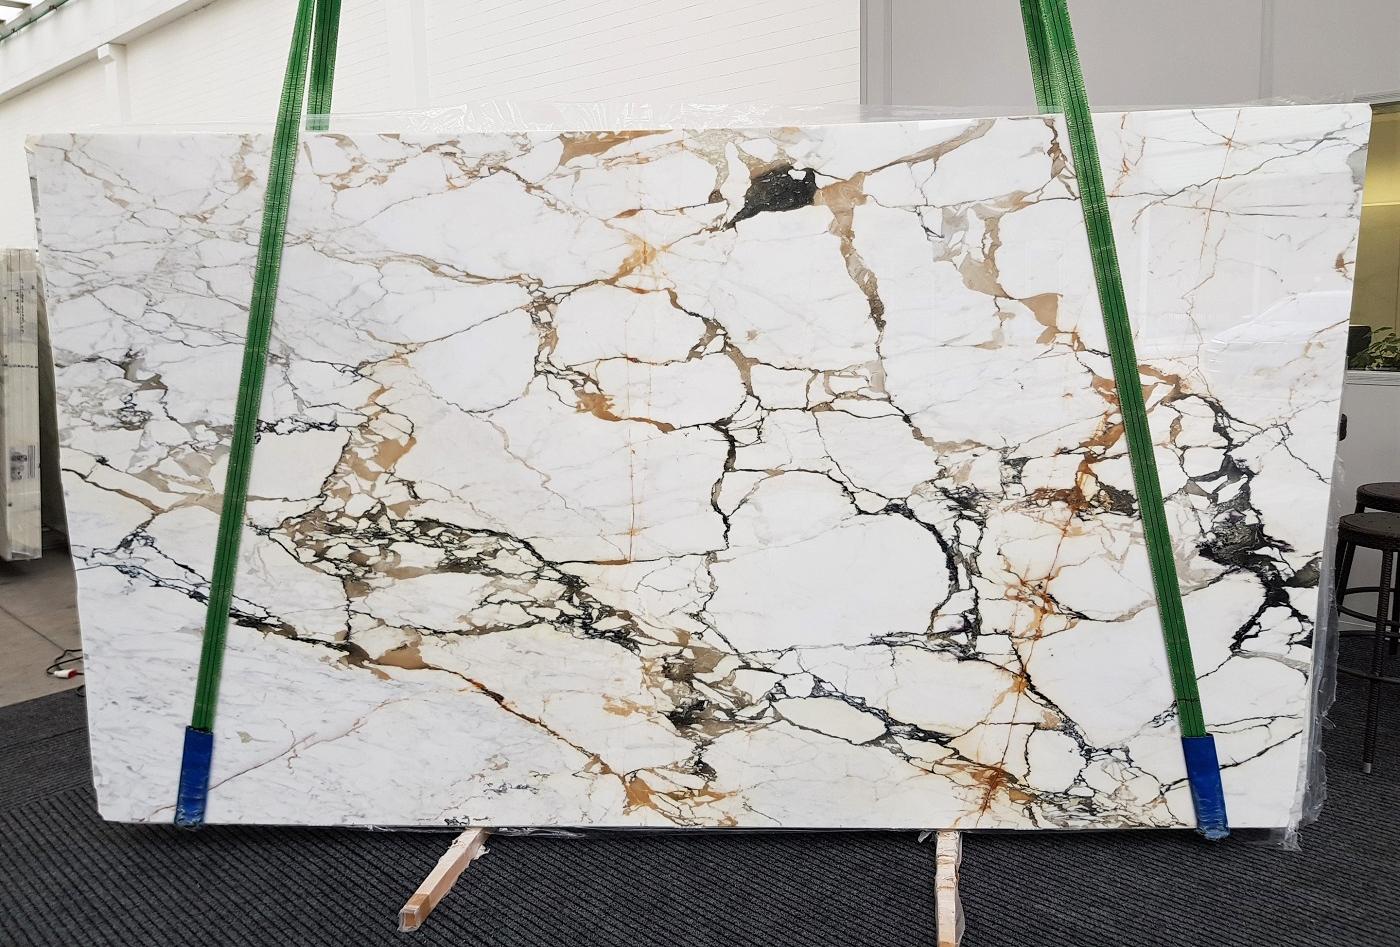 CALACATTA MACCHIAVECCHIA Suministro (Italia) de planchas pulidas en mármol natural GL 1131 , Bundle #7